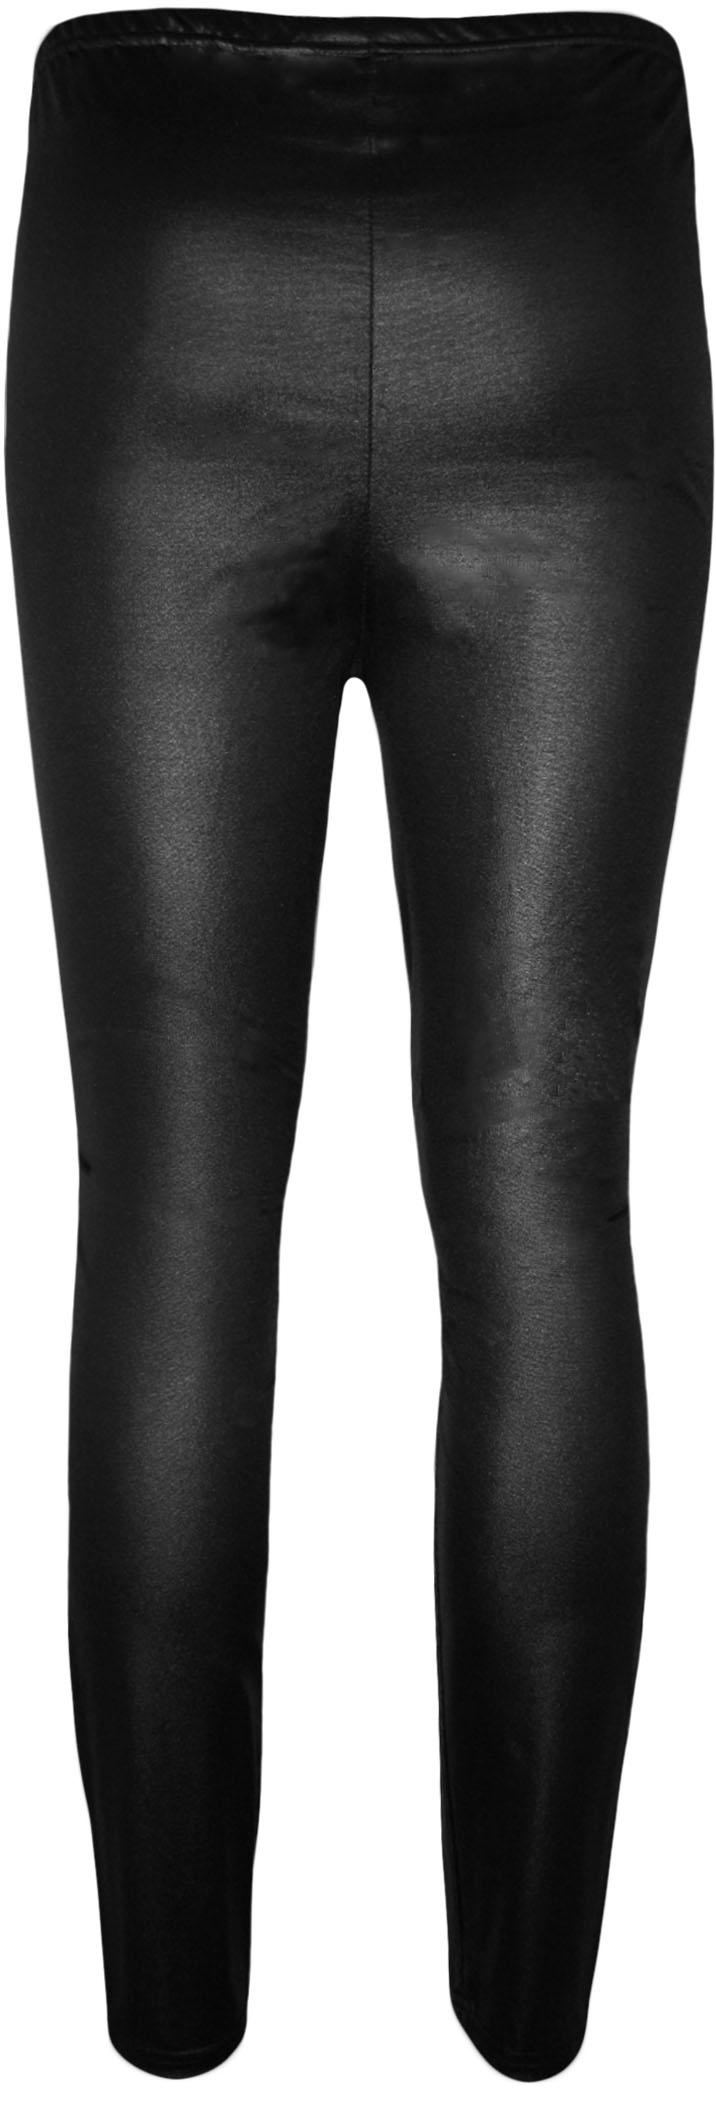 neu damen plus grosse nass aussehen gl nzend damen voll lang leggings hose ebay. Black Bedroom Furniture Sets. Home Design Ideas